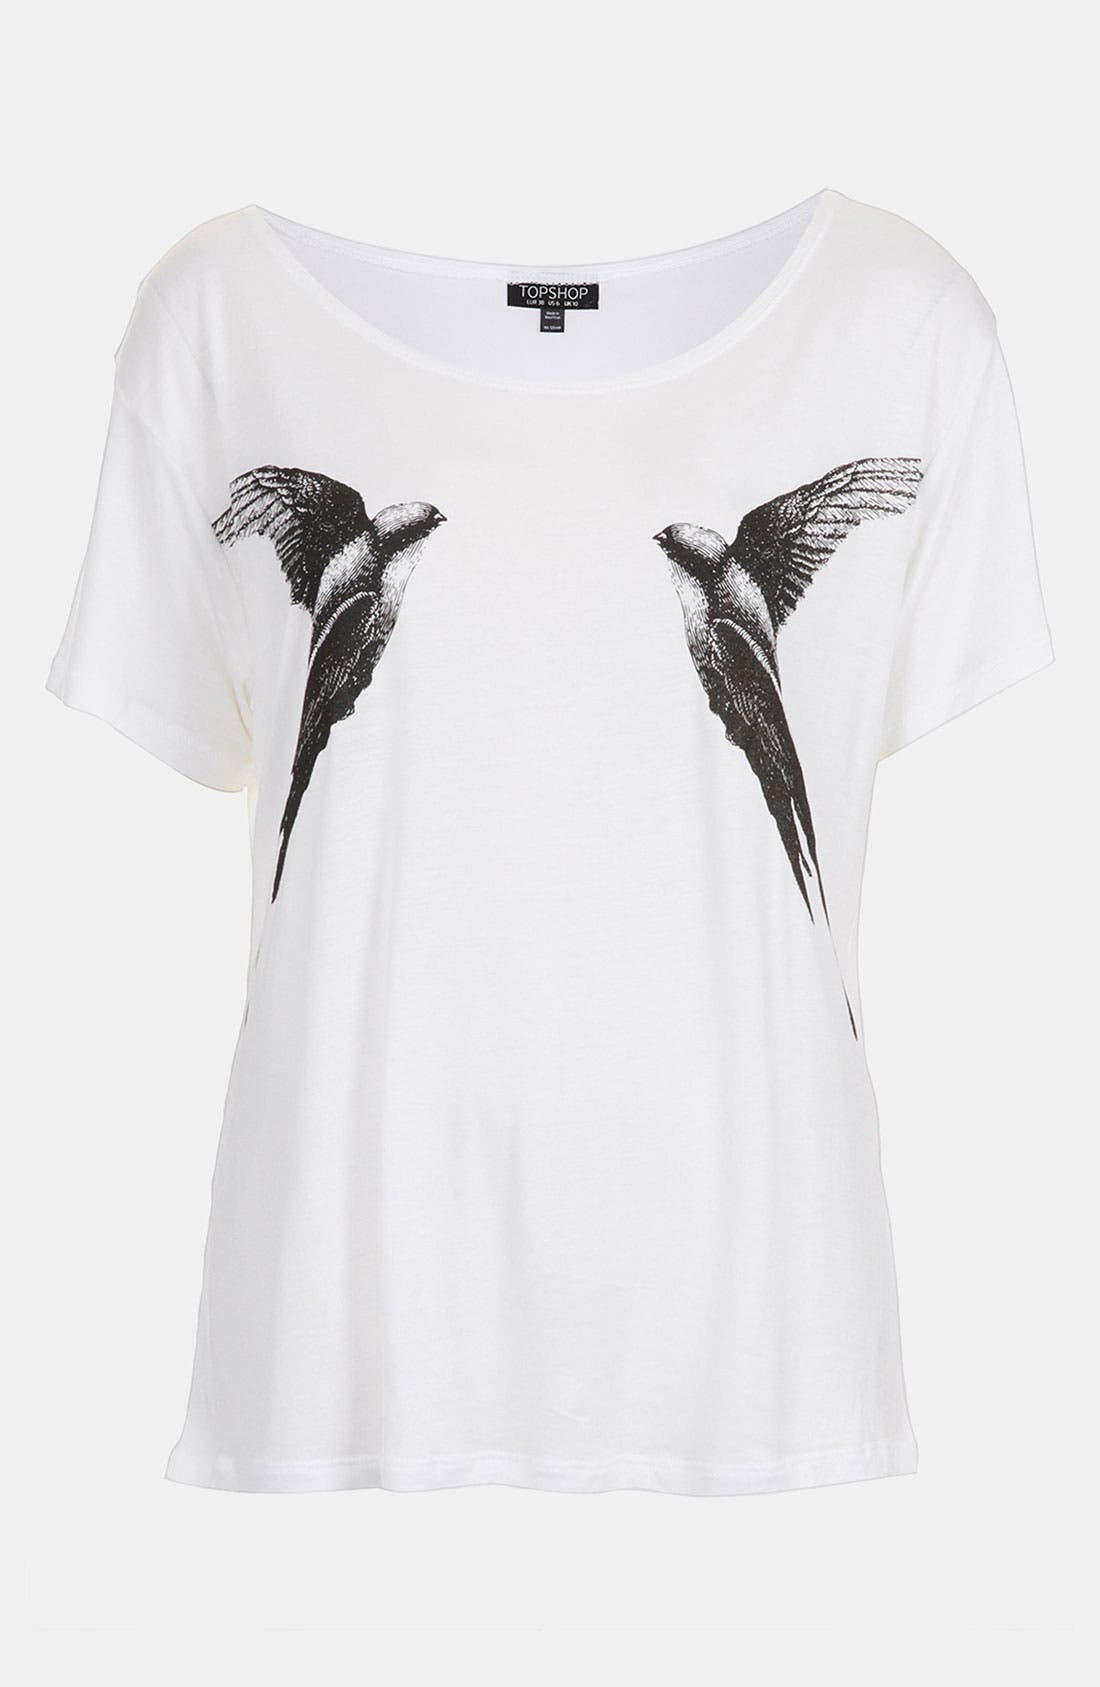 Main Image - Topshop 'Mirror Bird' Graphic Tee